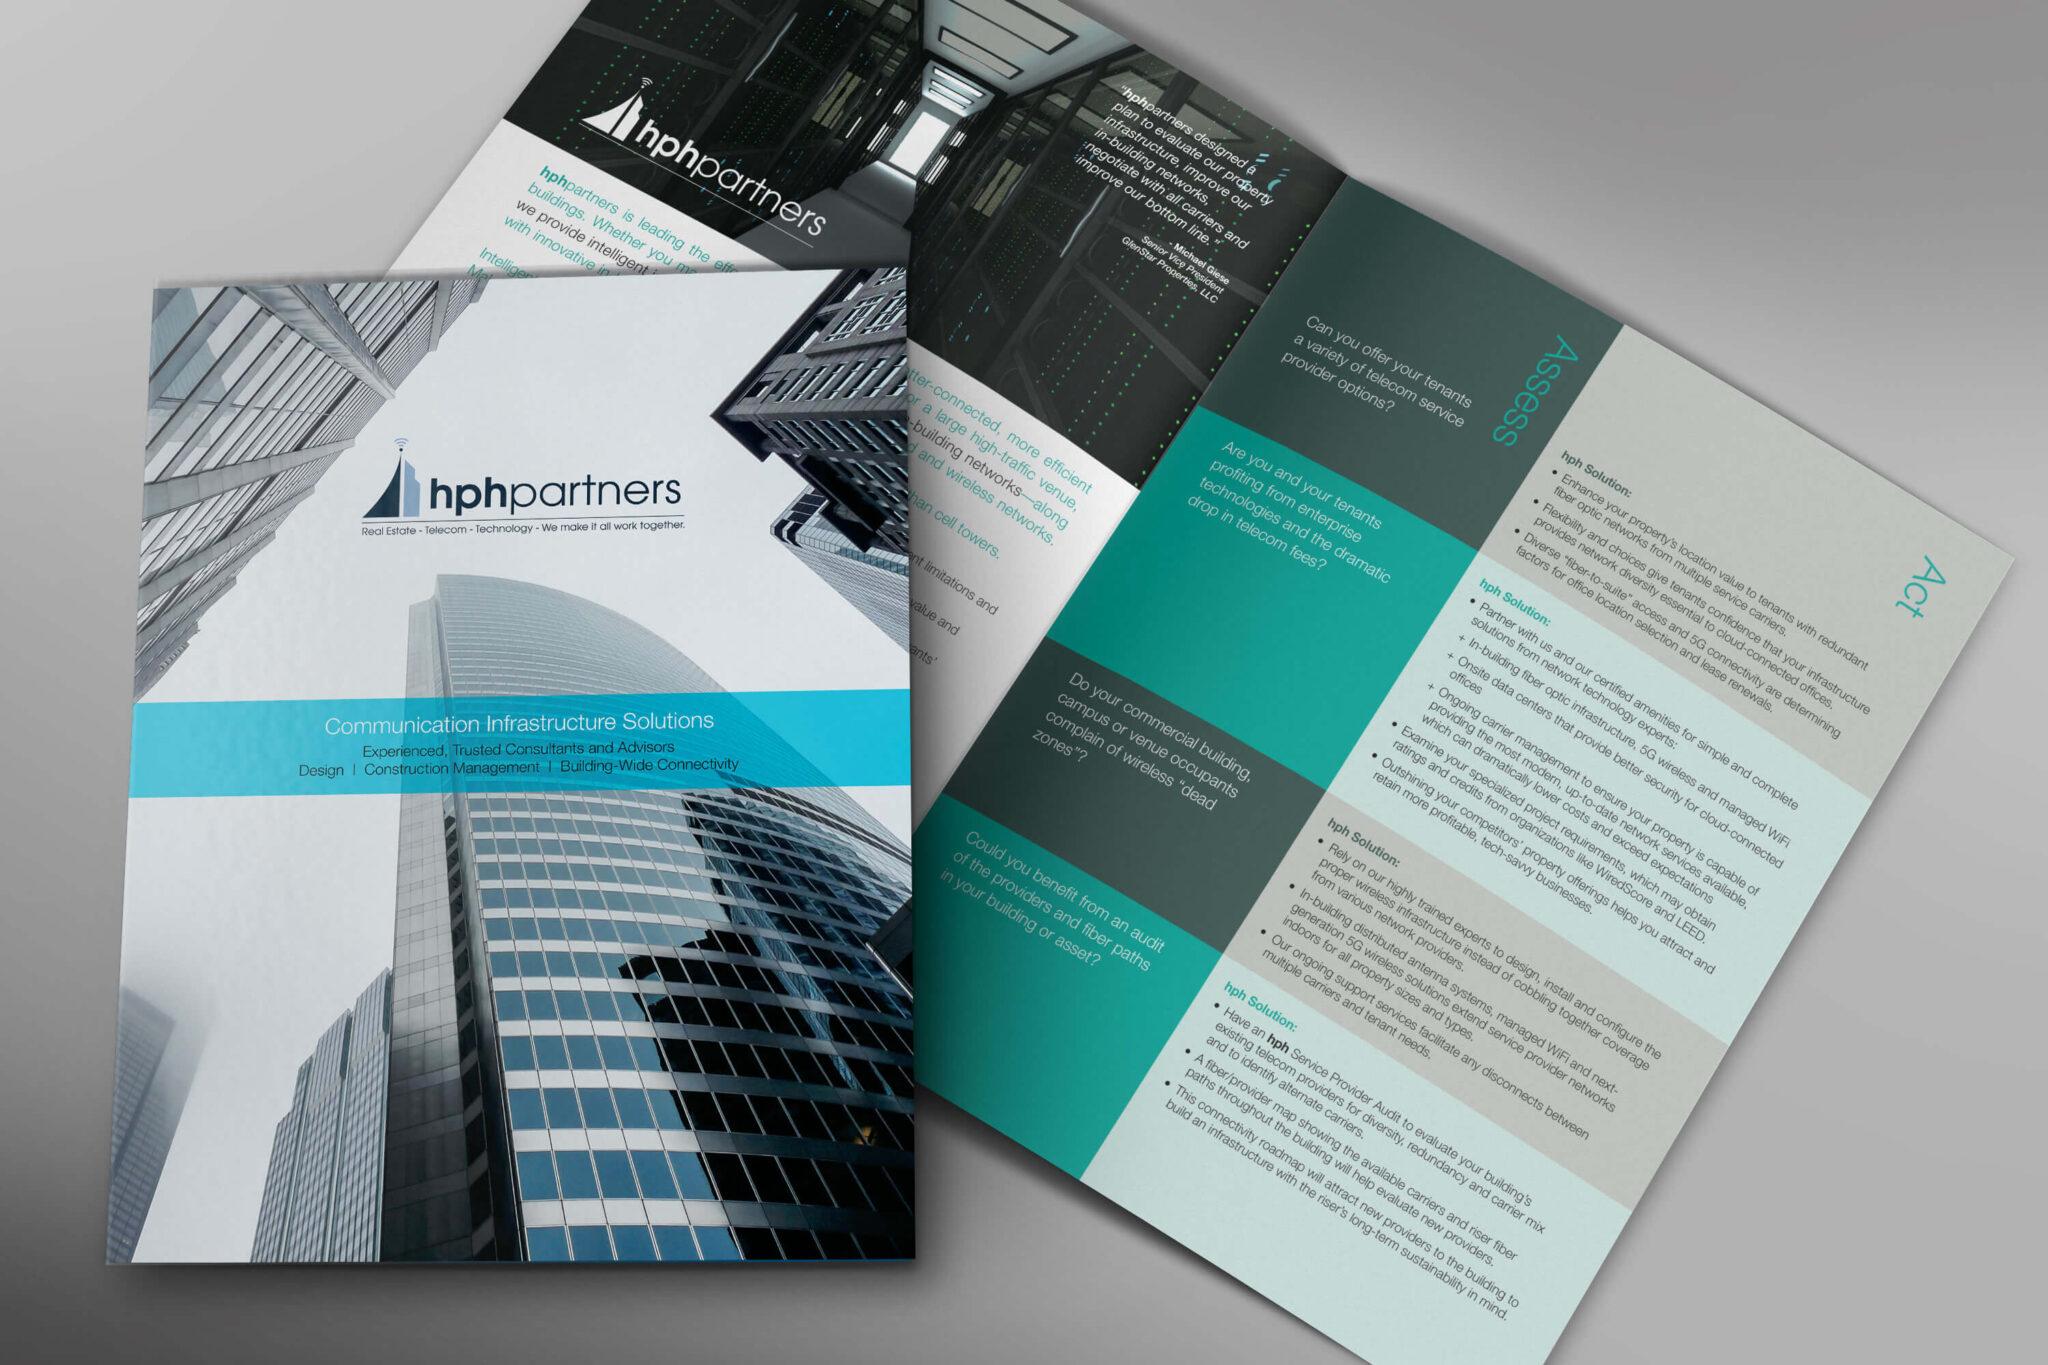 HPH Partners Brochure